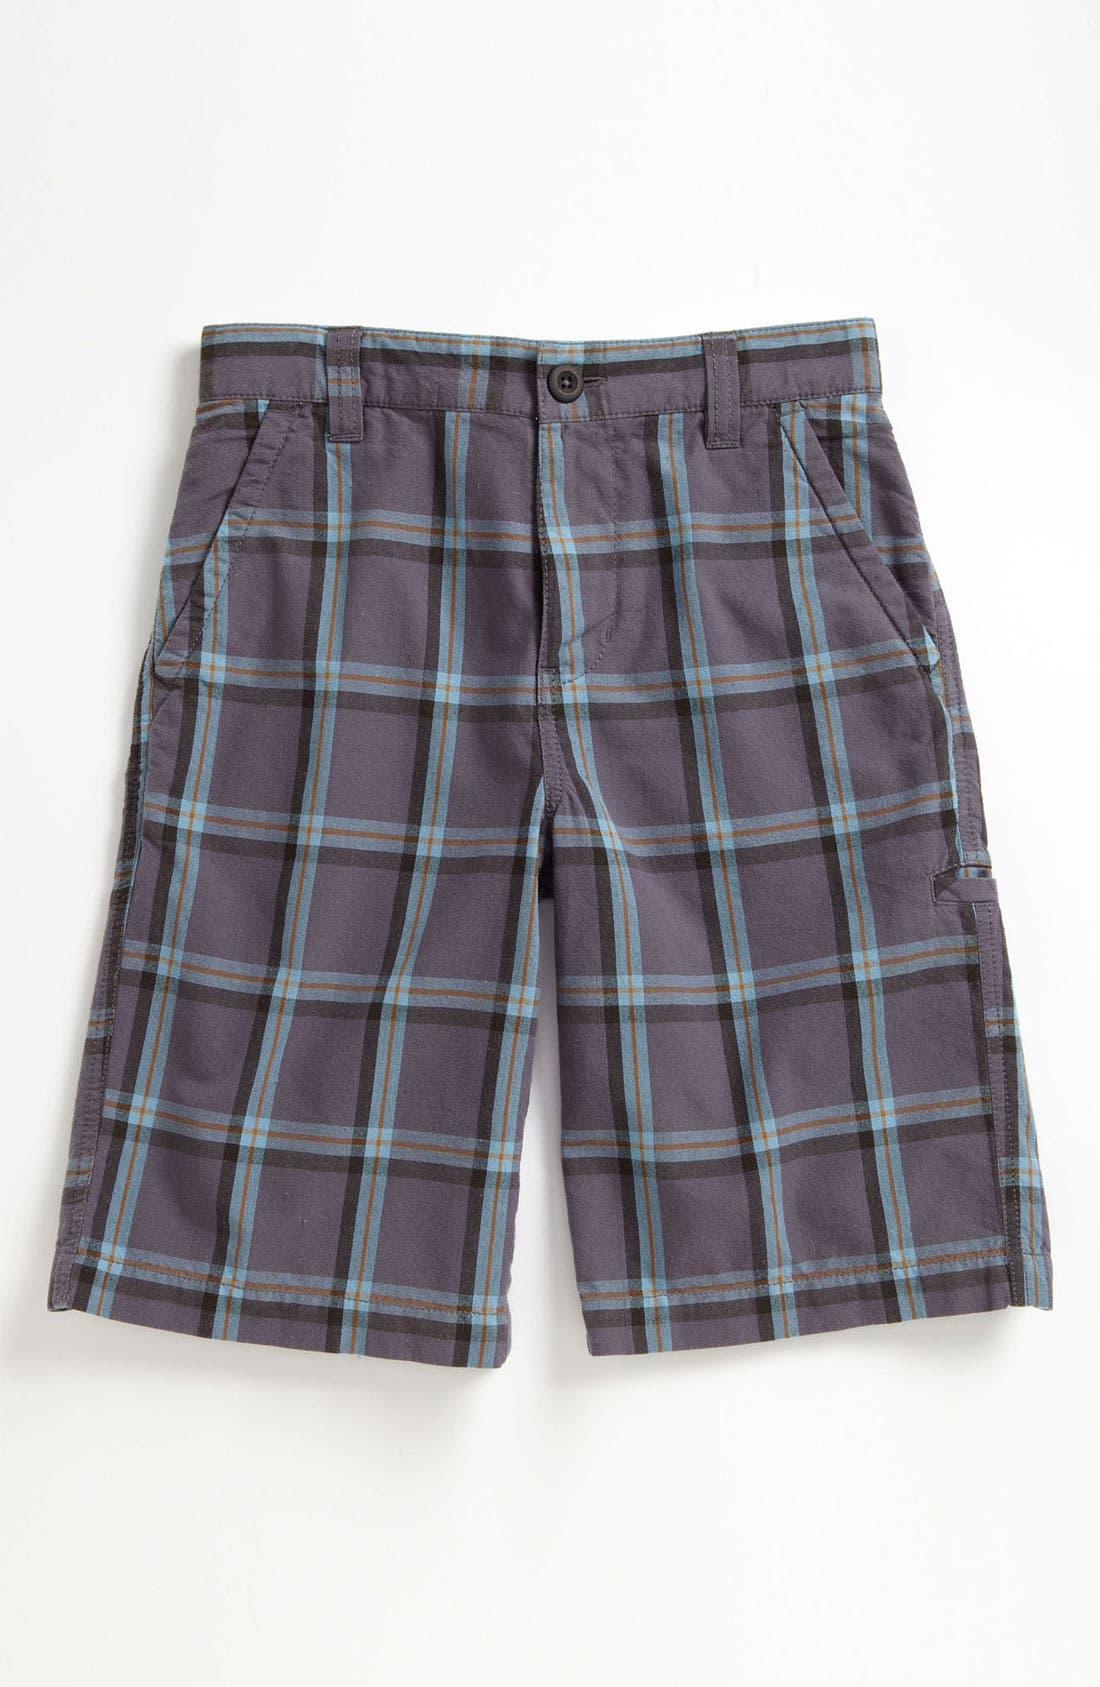 Alternate Image 1 Selected - Tucker + Tate 'Trevor' Plaid Shorts (Little Boys & Big Boys)